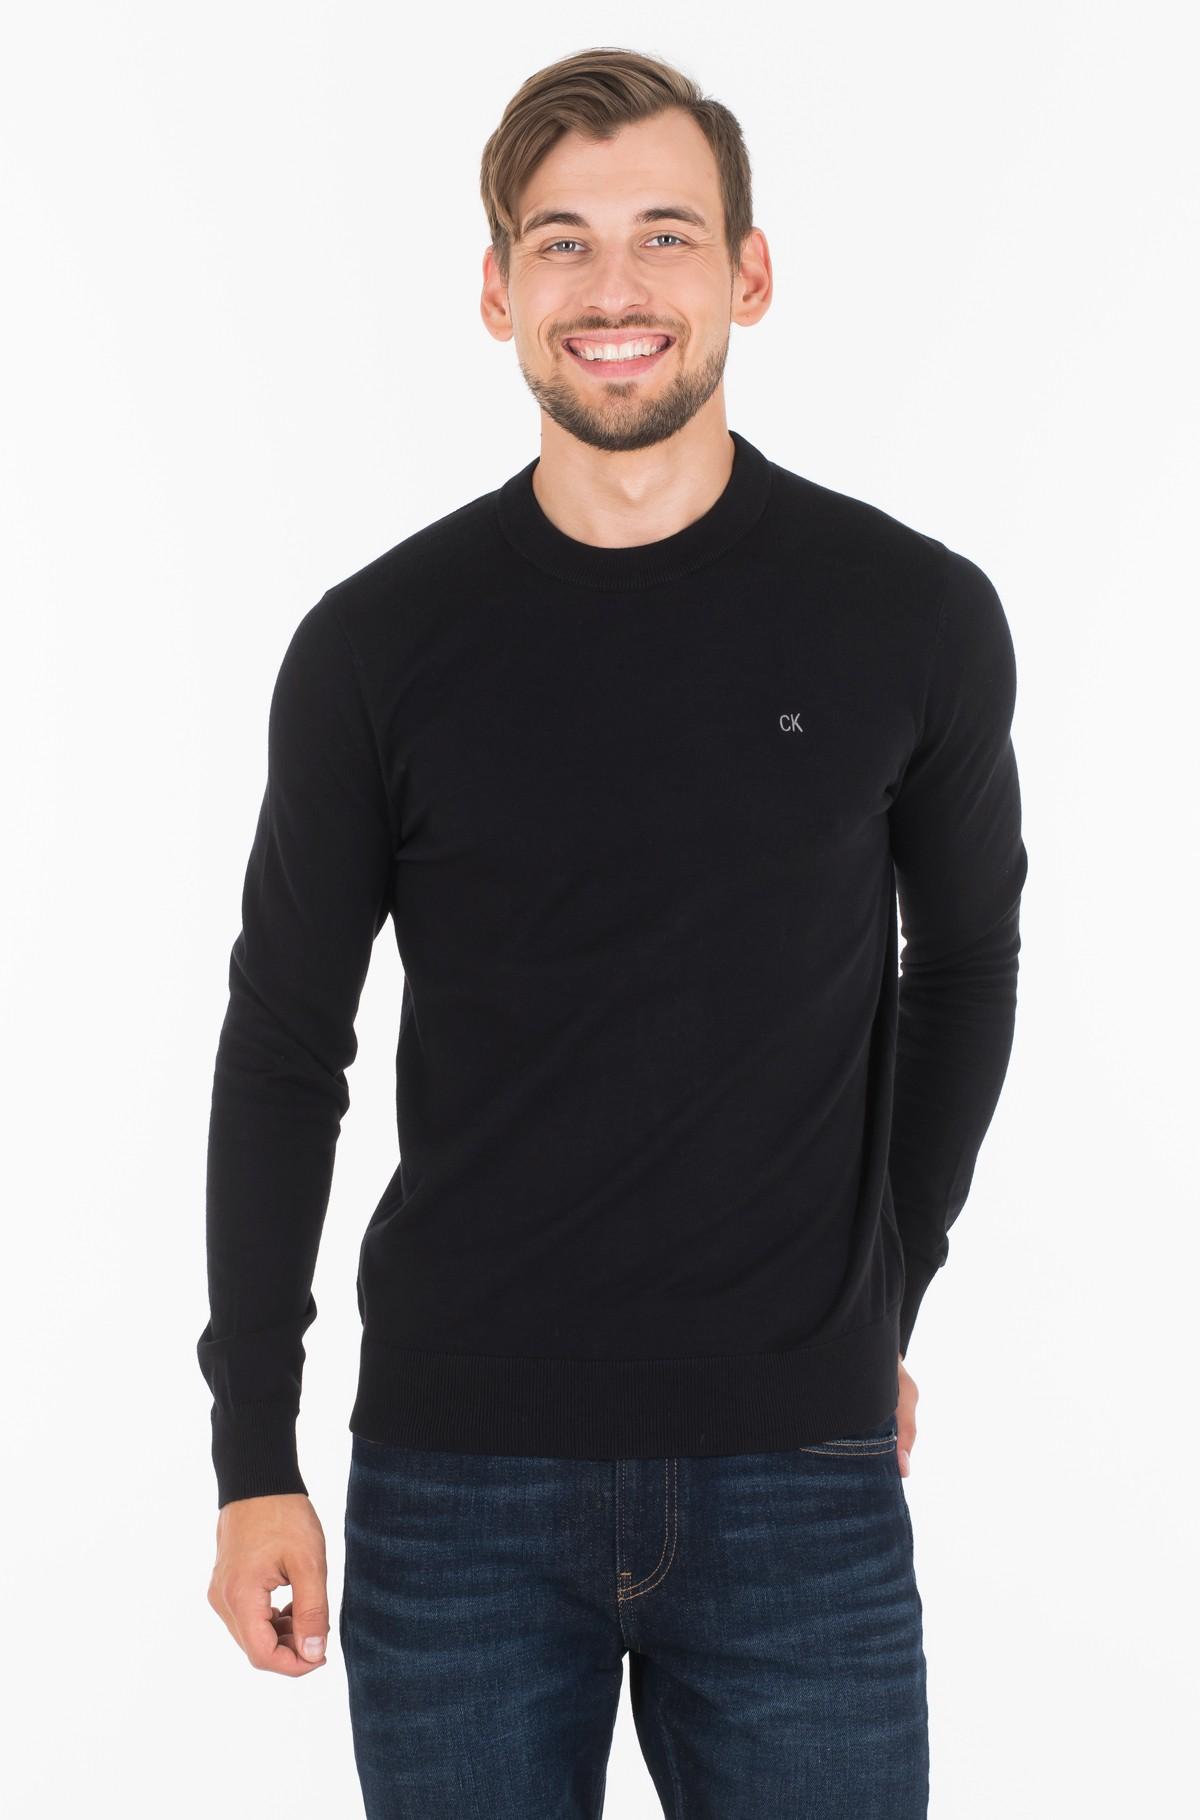 Sweater COTTON BLEND CN EMBRO SWEATER-full-1